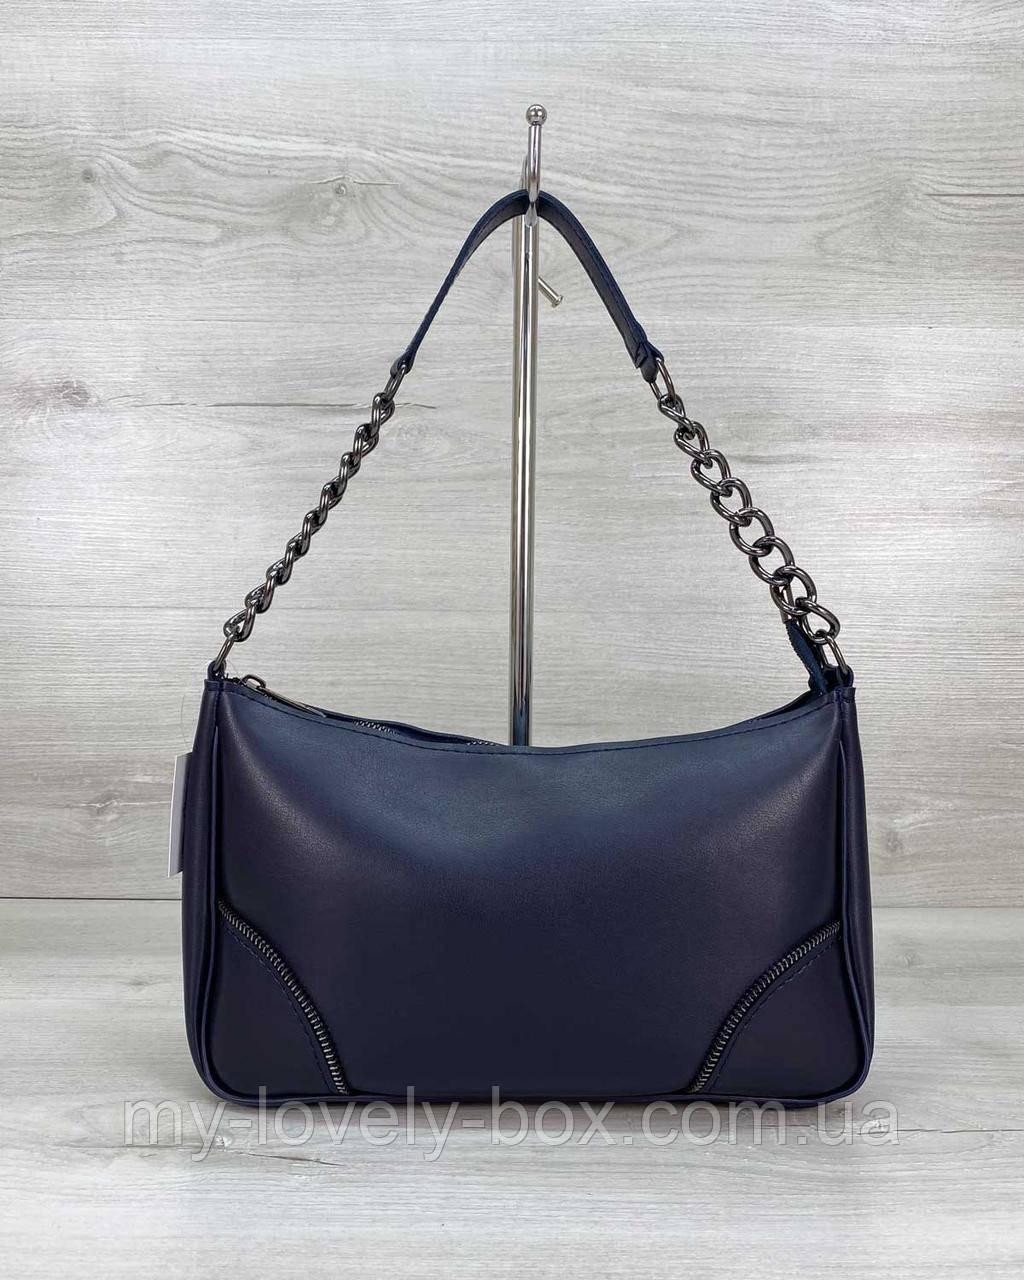 Жіноча сумка «Луна» темно синя